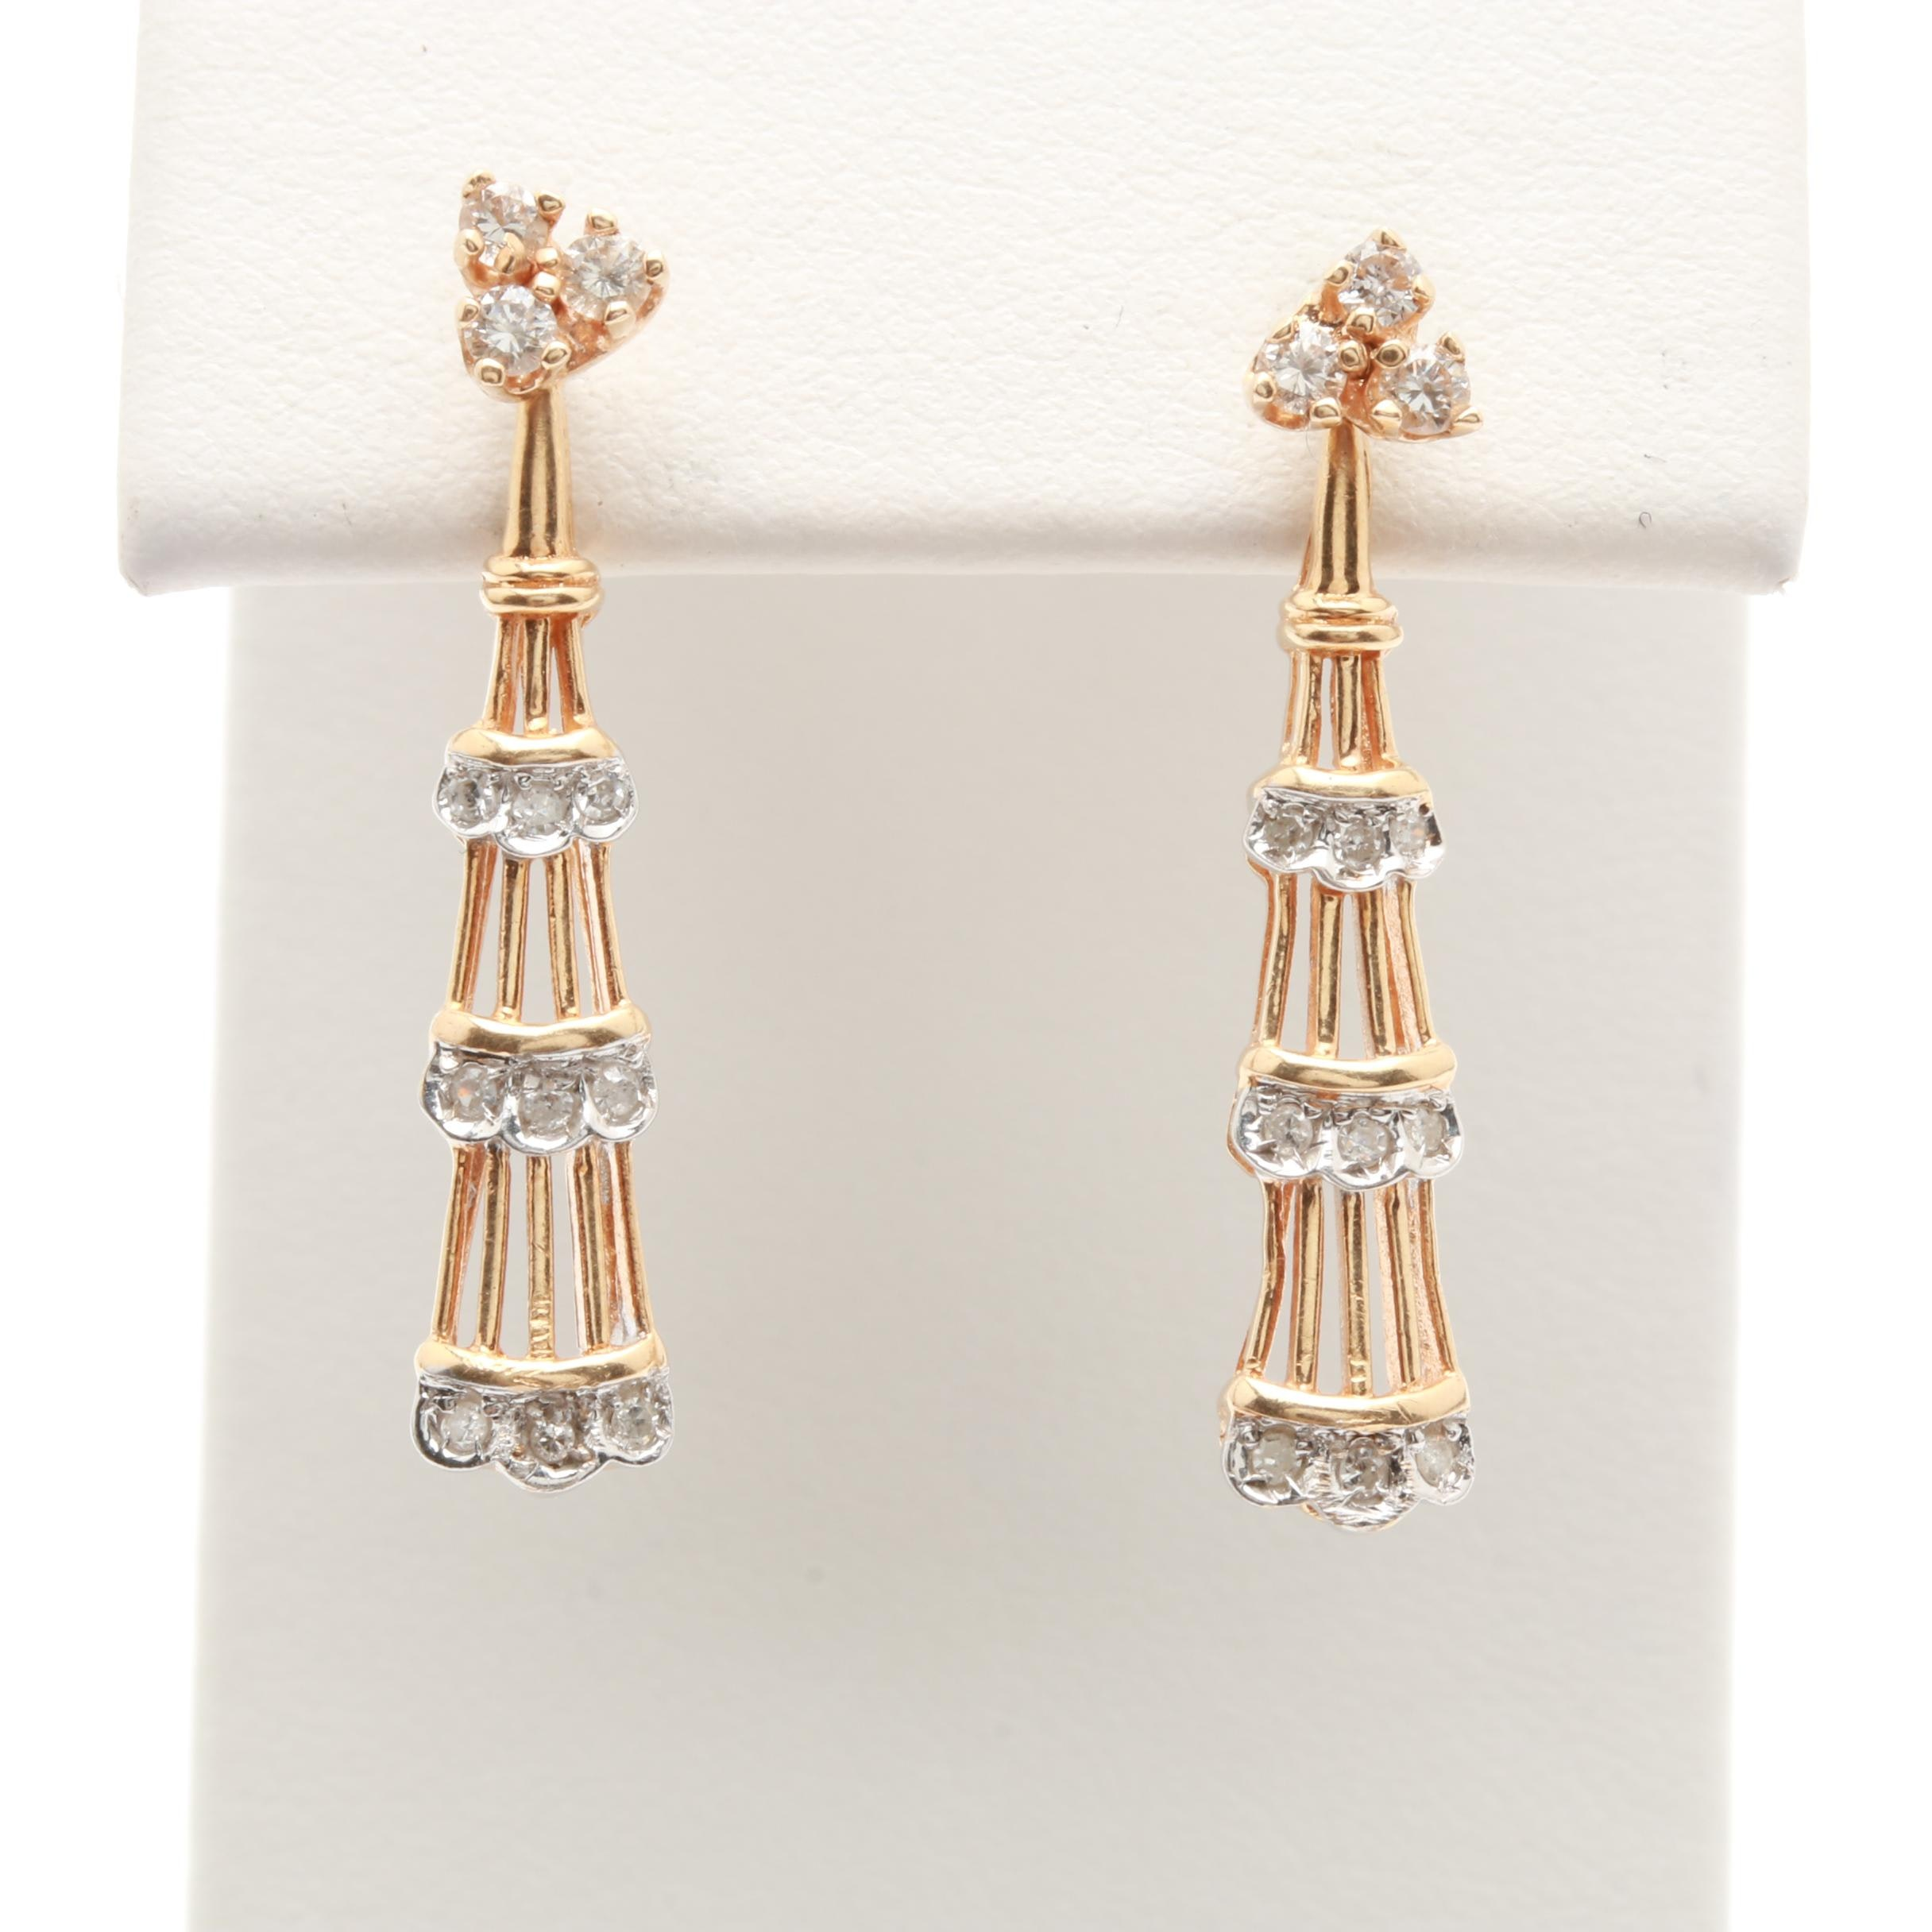 14K Yellow Gold Diamond Stud Earrings With Diamond Jackets